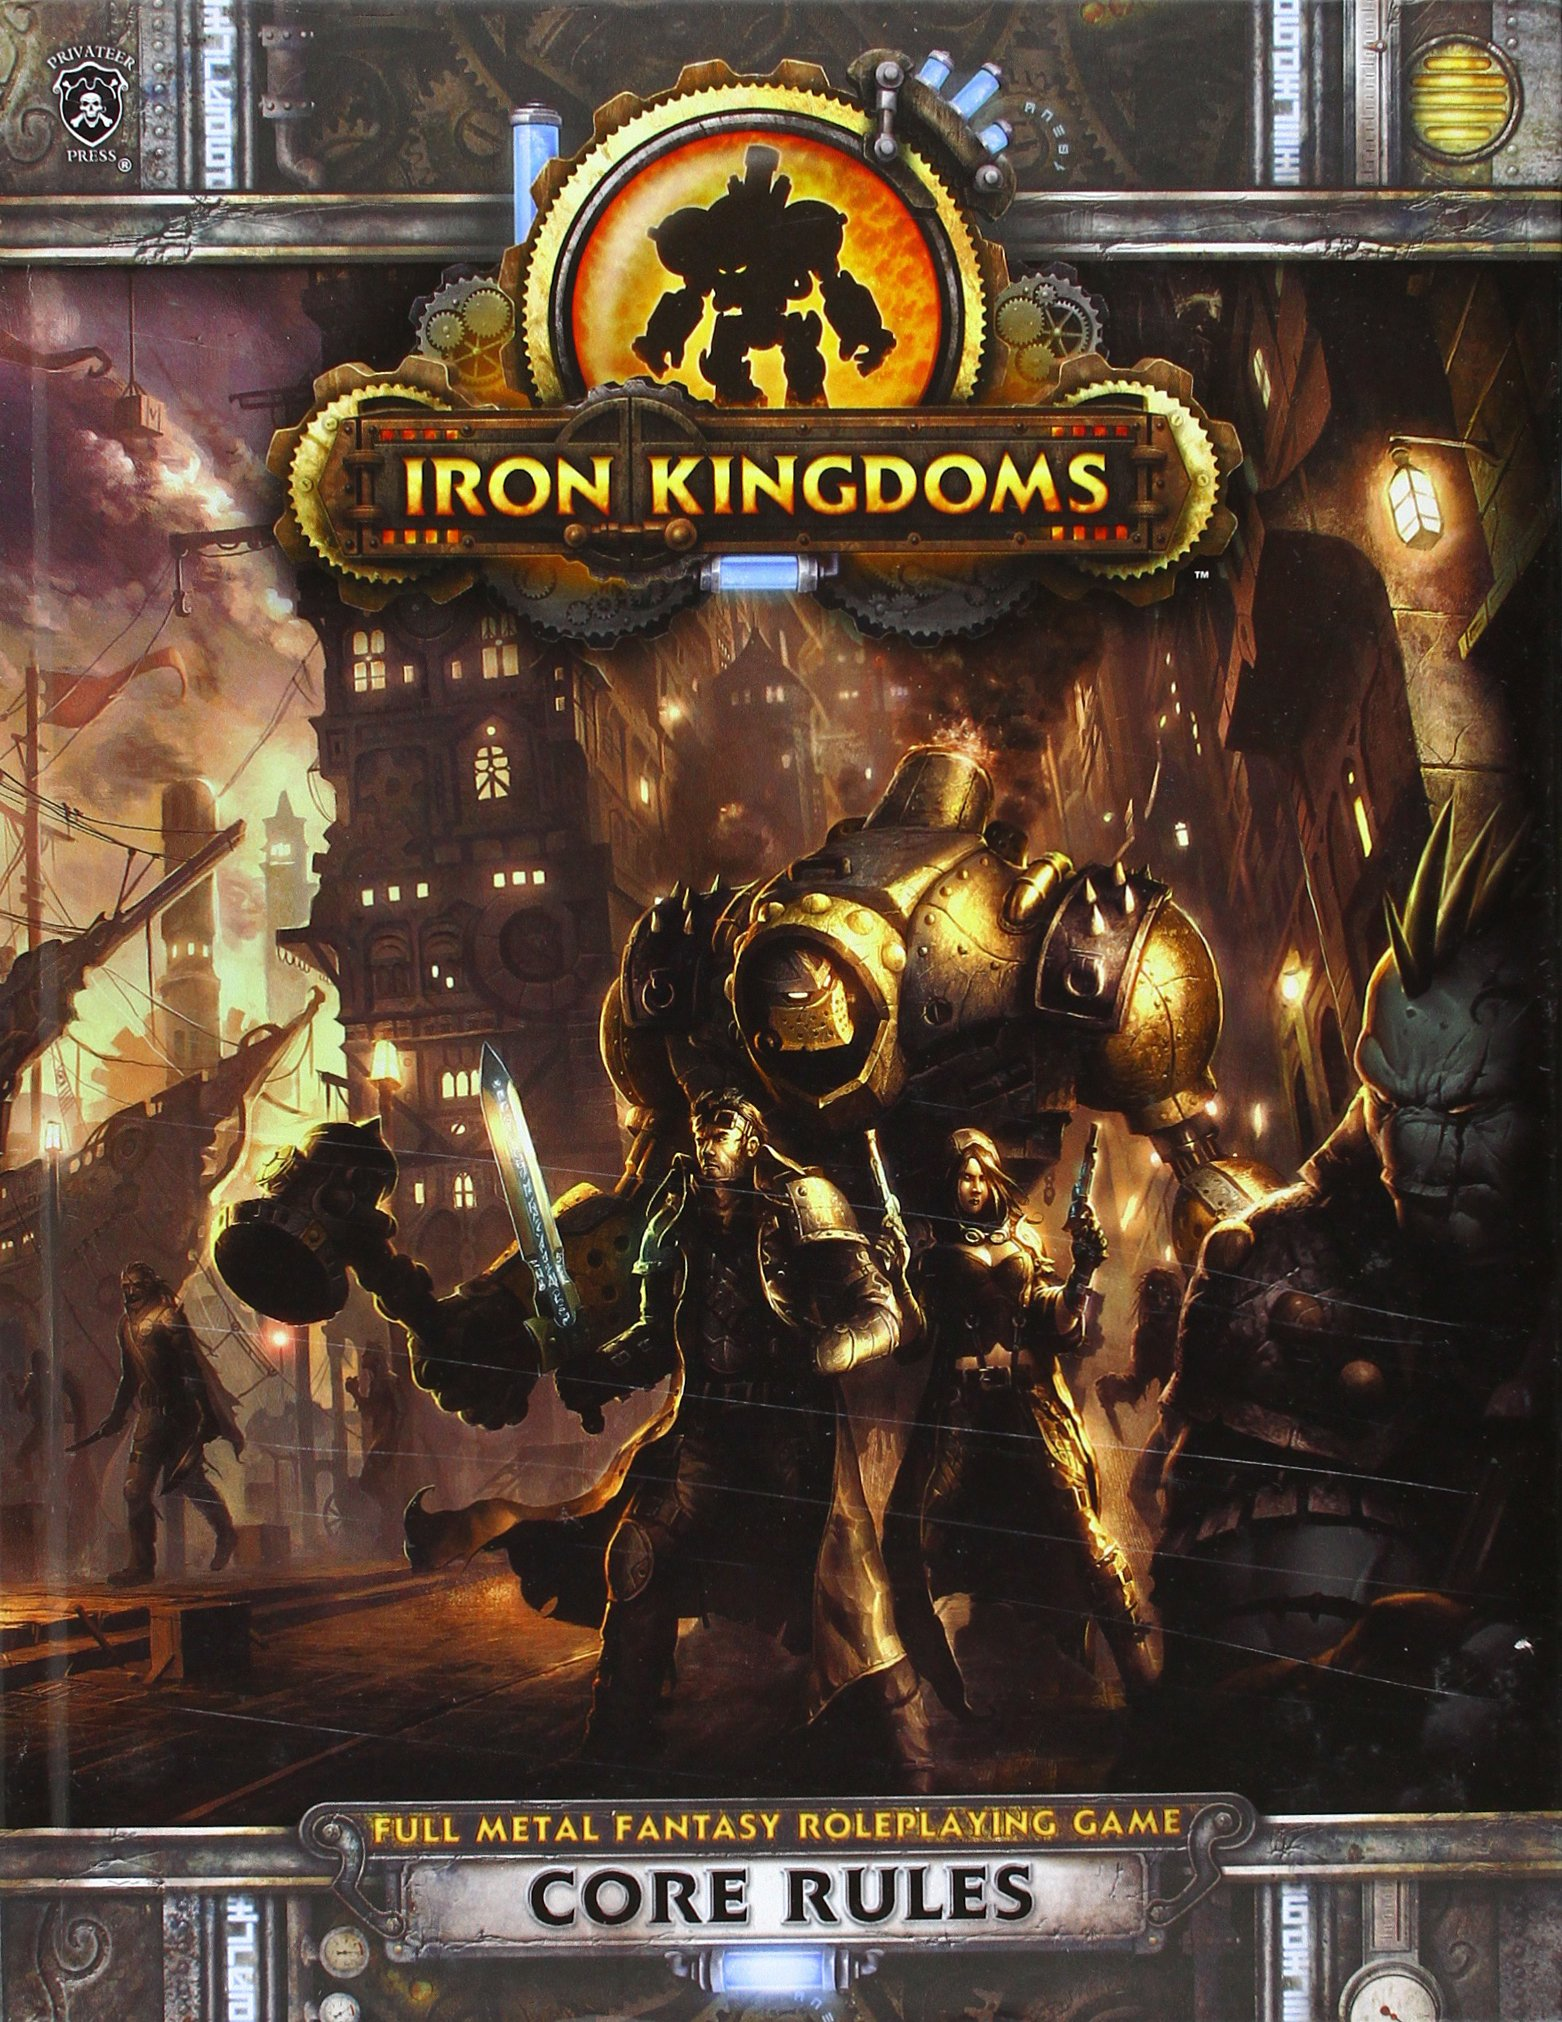 Iron Kingdoms RPG Core Rules